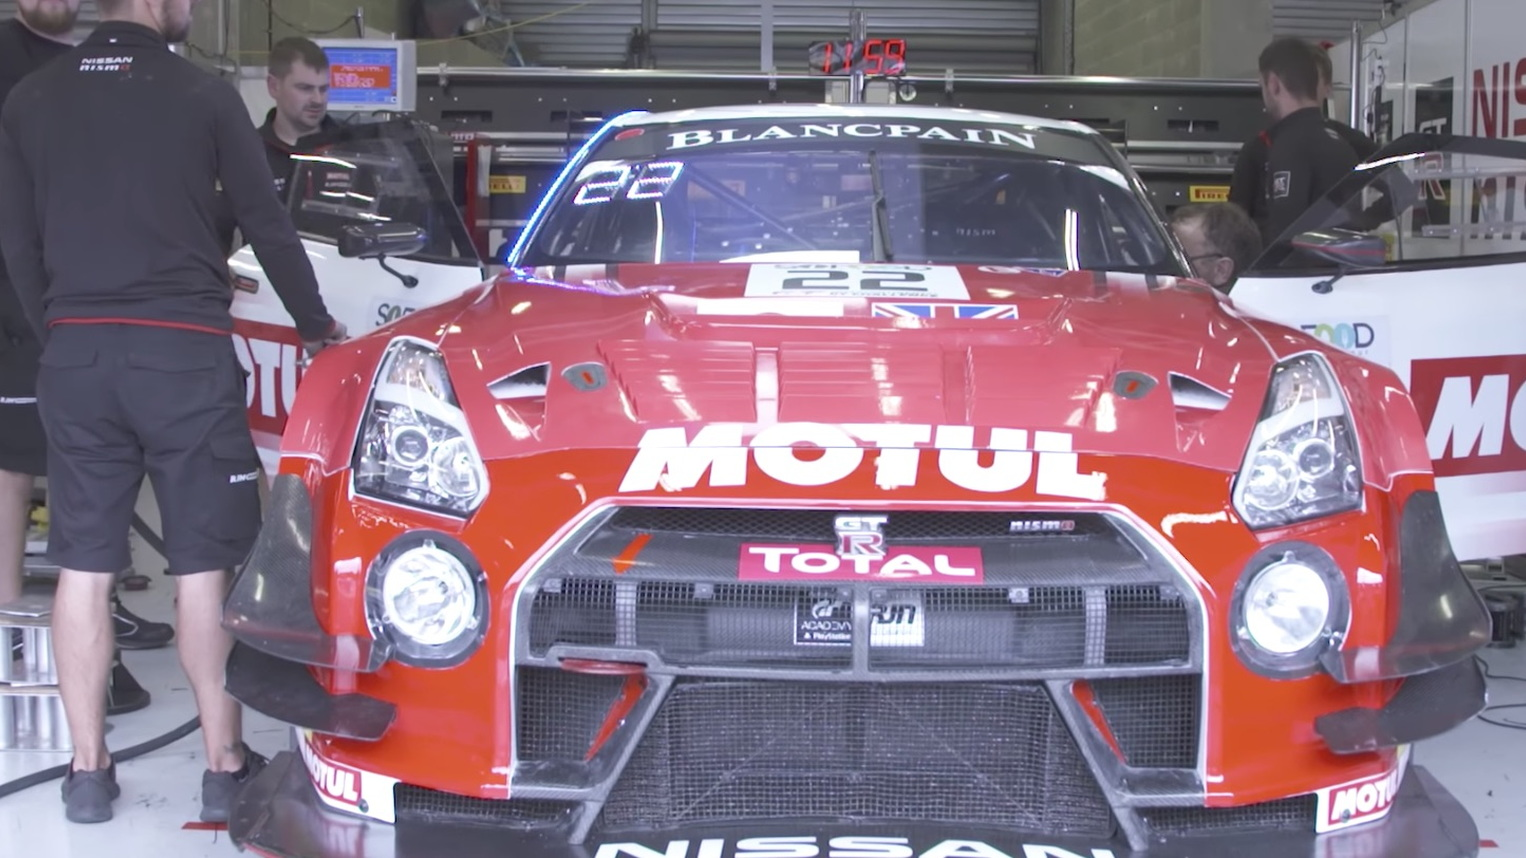 Rebuilt Nismo GT-R GT3 race car